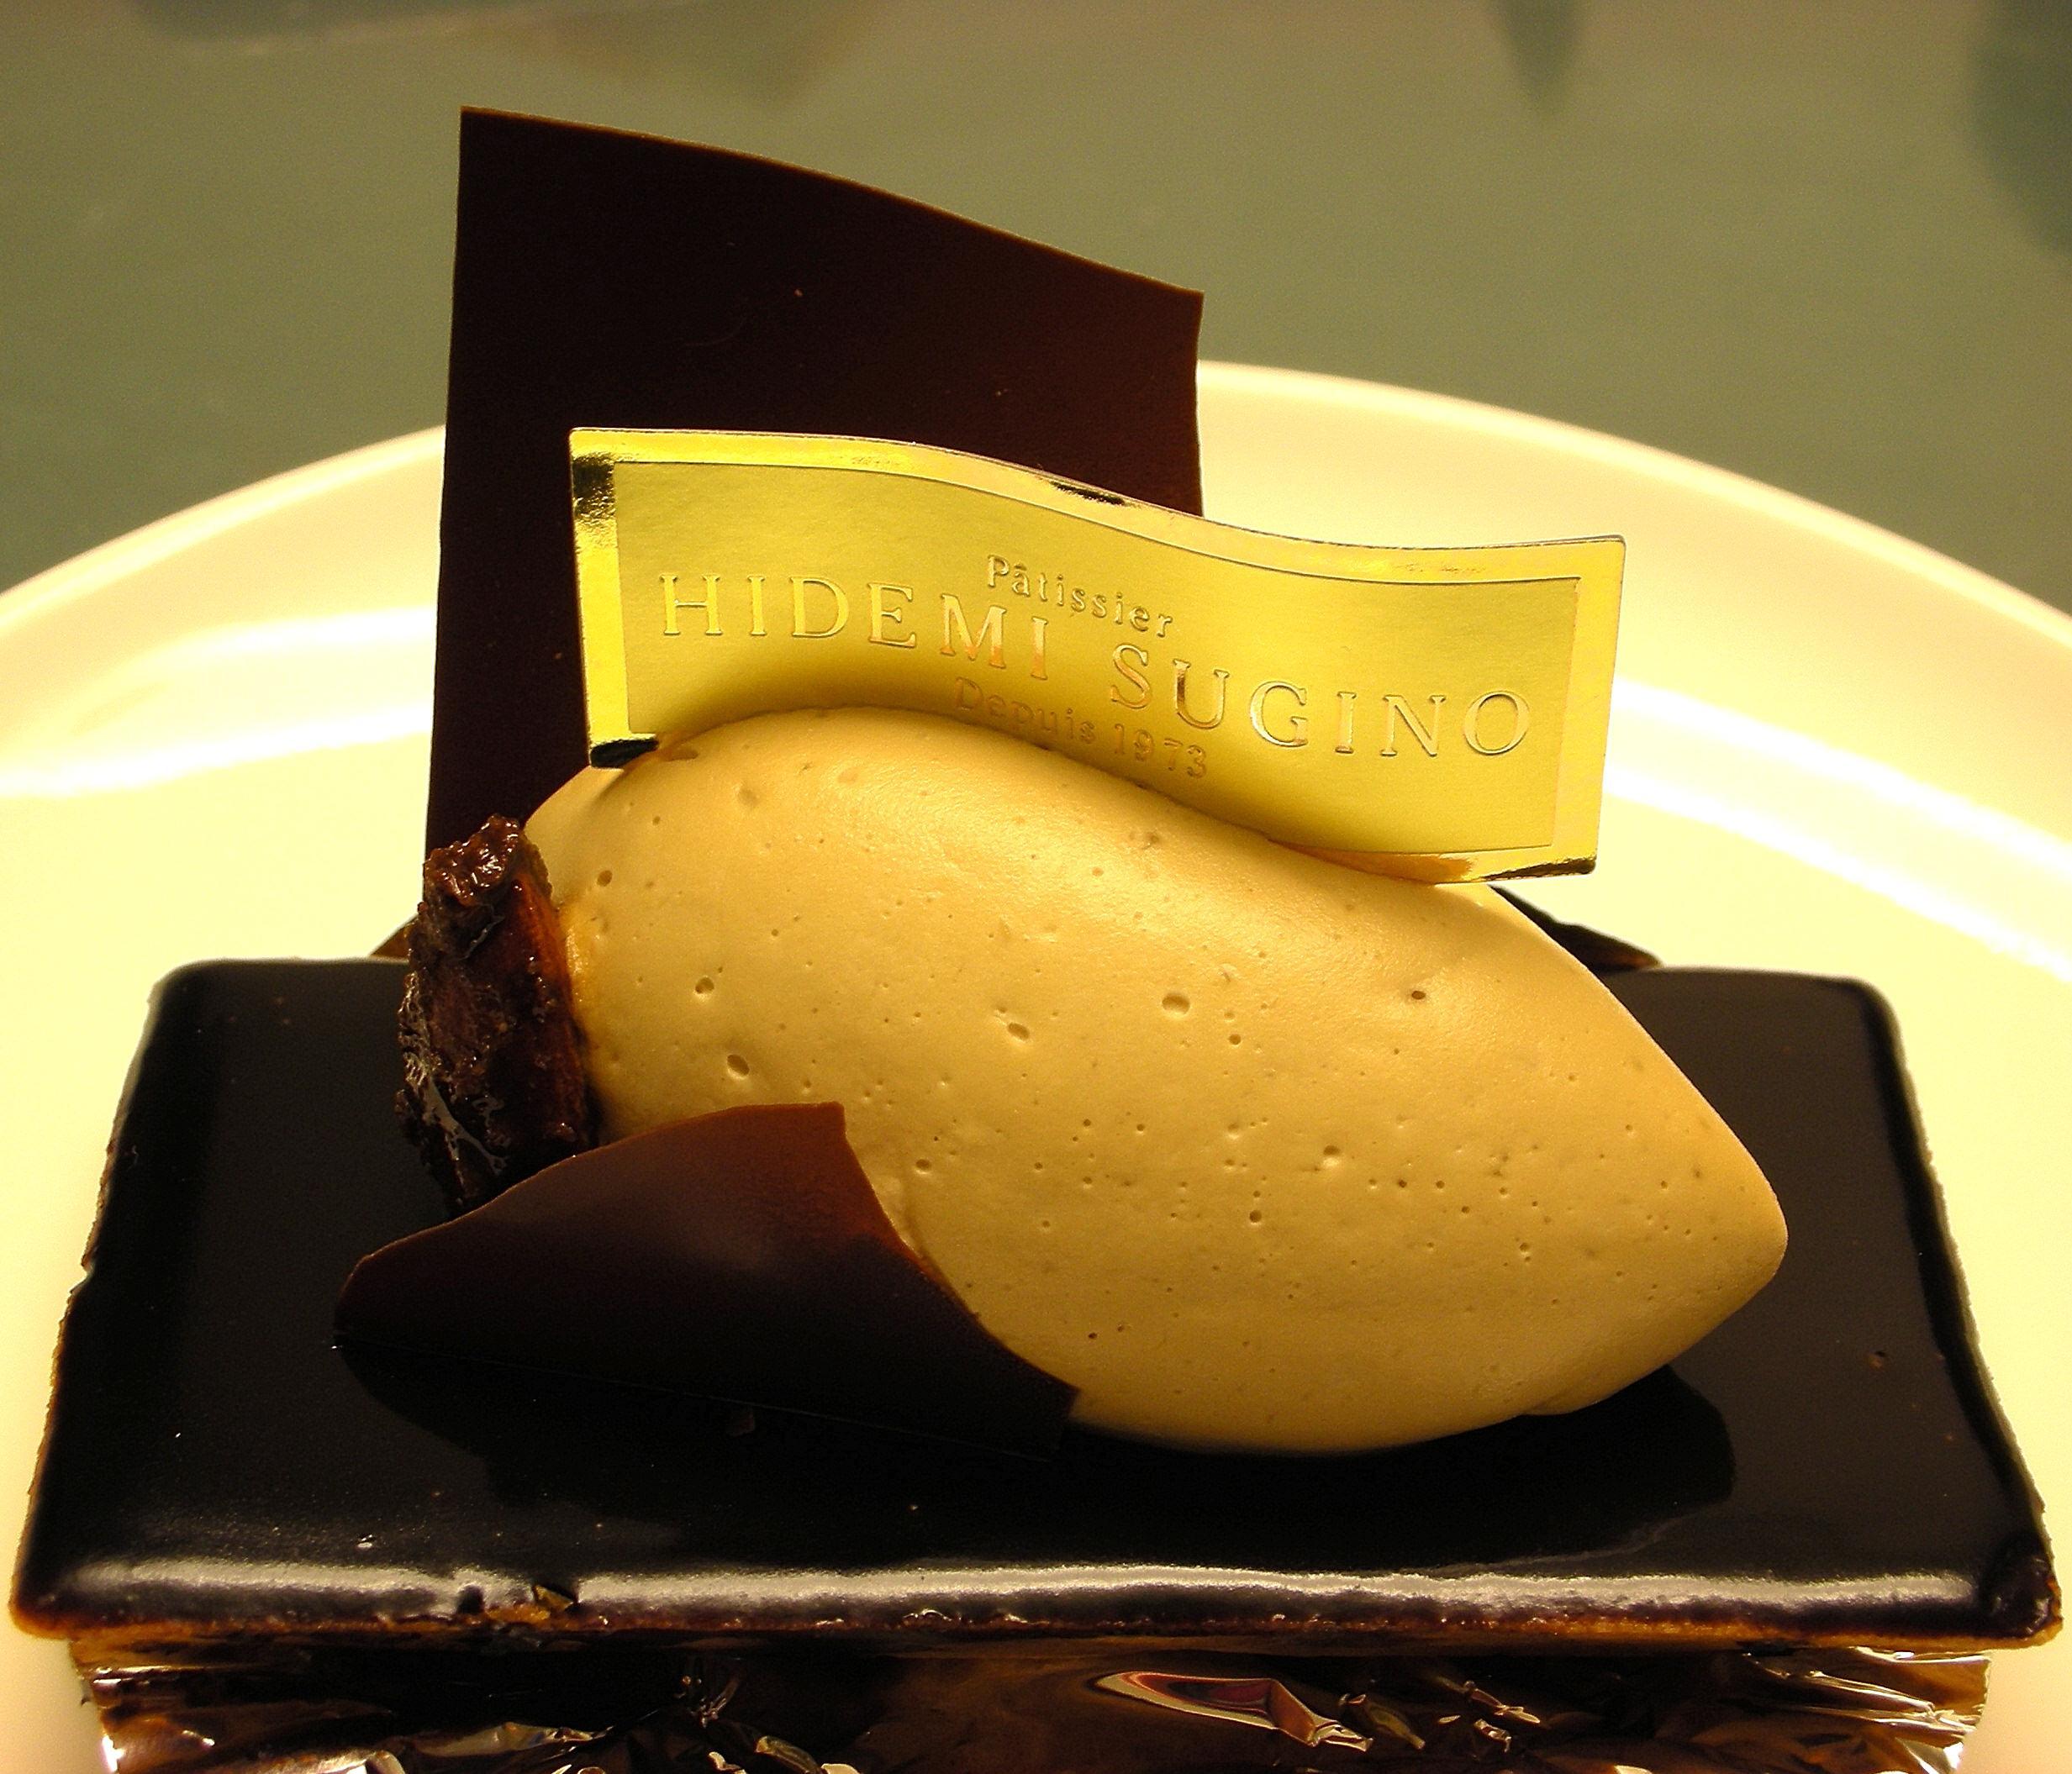 Relais Dessertsa加盟パティシエが作るテイクアウト不可の幻スイーツ